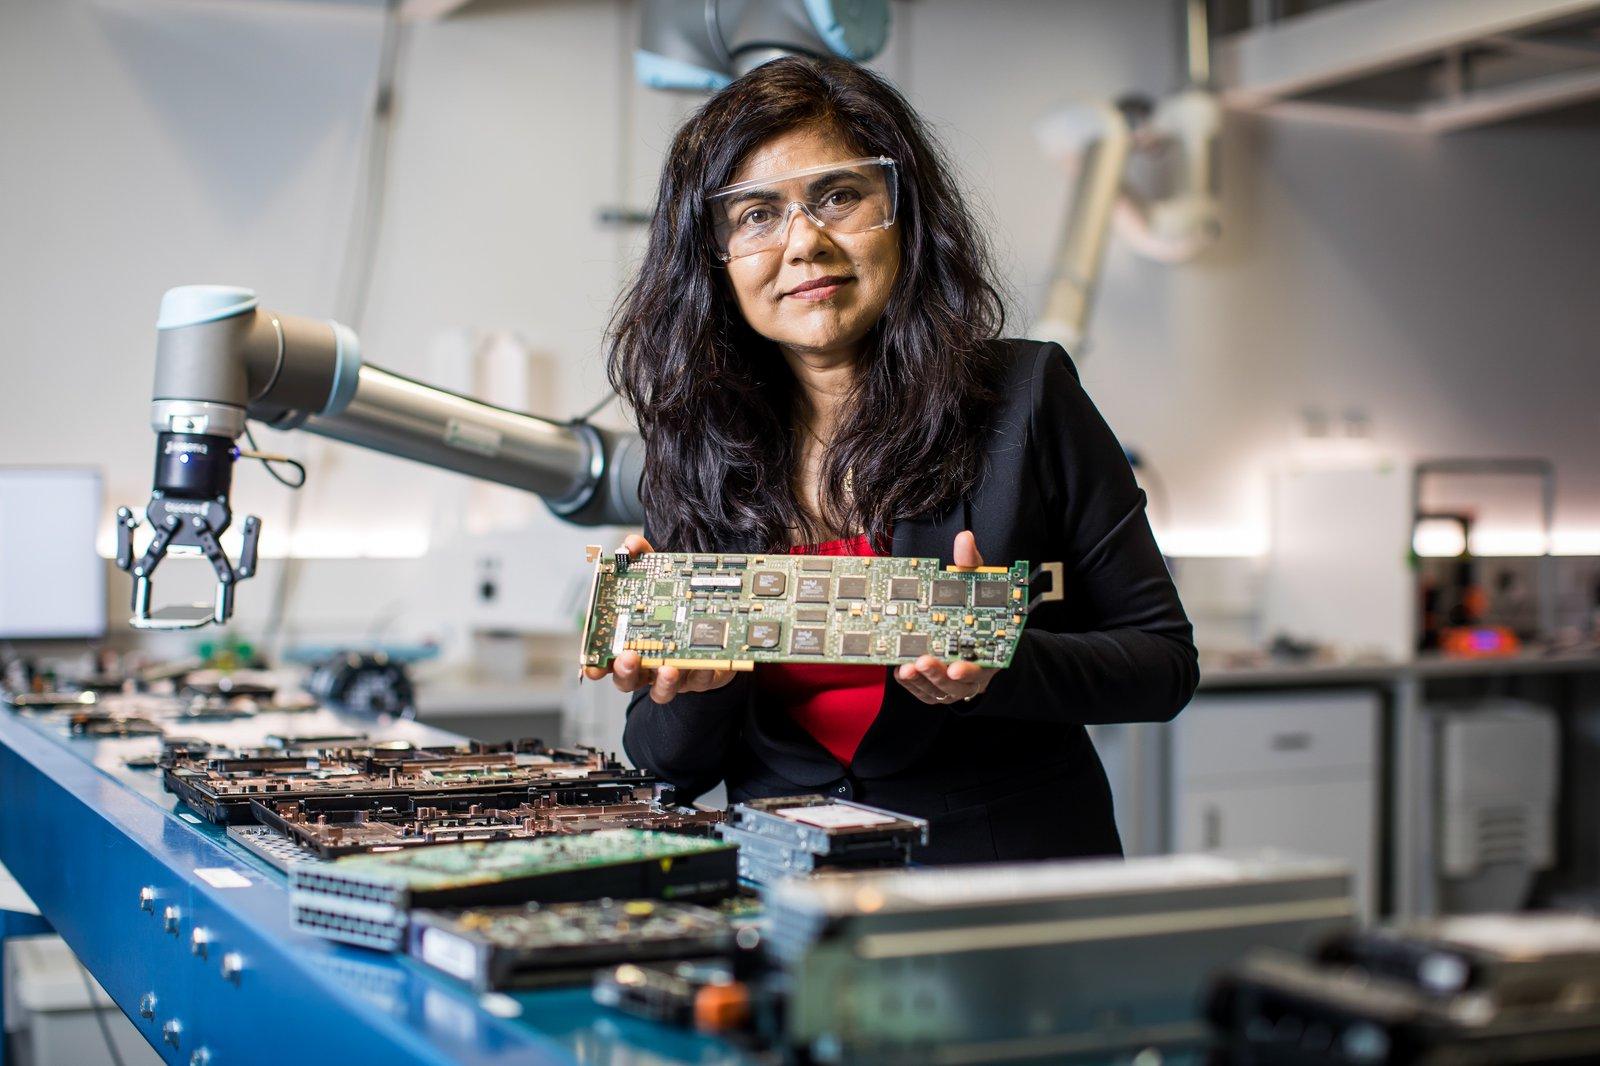 Professor Veena Sahajwalla - Finalist, 2021 Celestino Eureka Prize for Promoting Understanding of Science